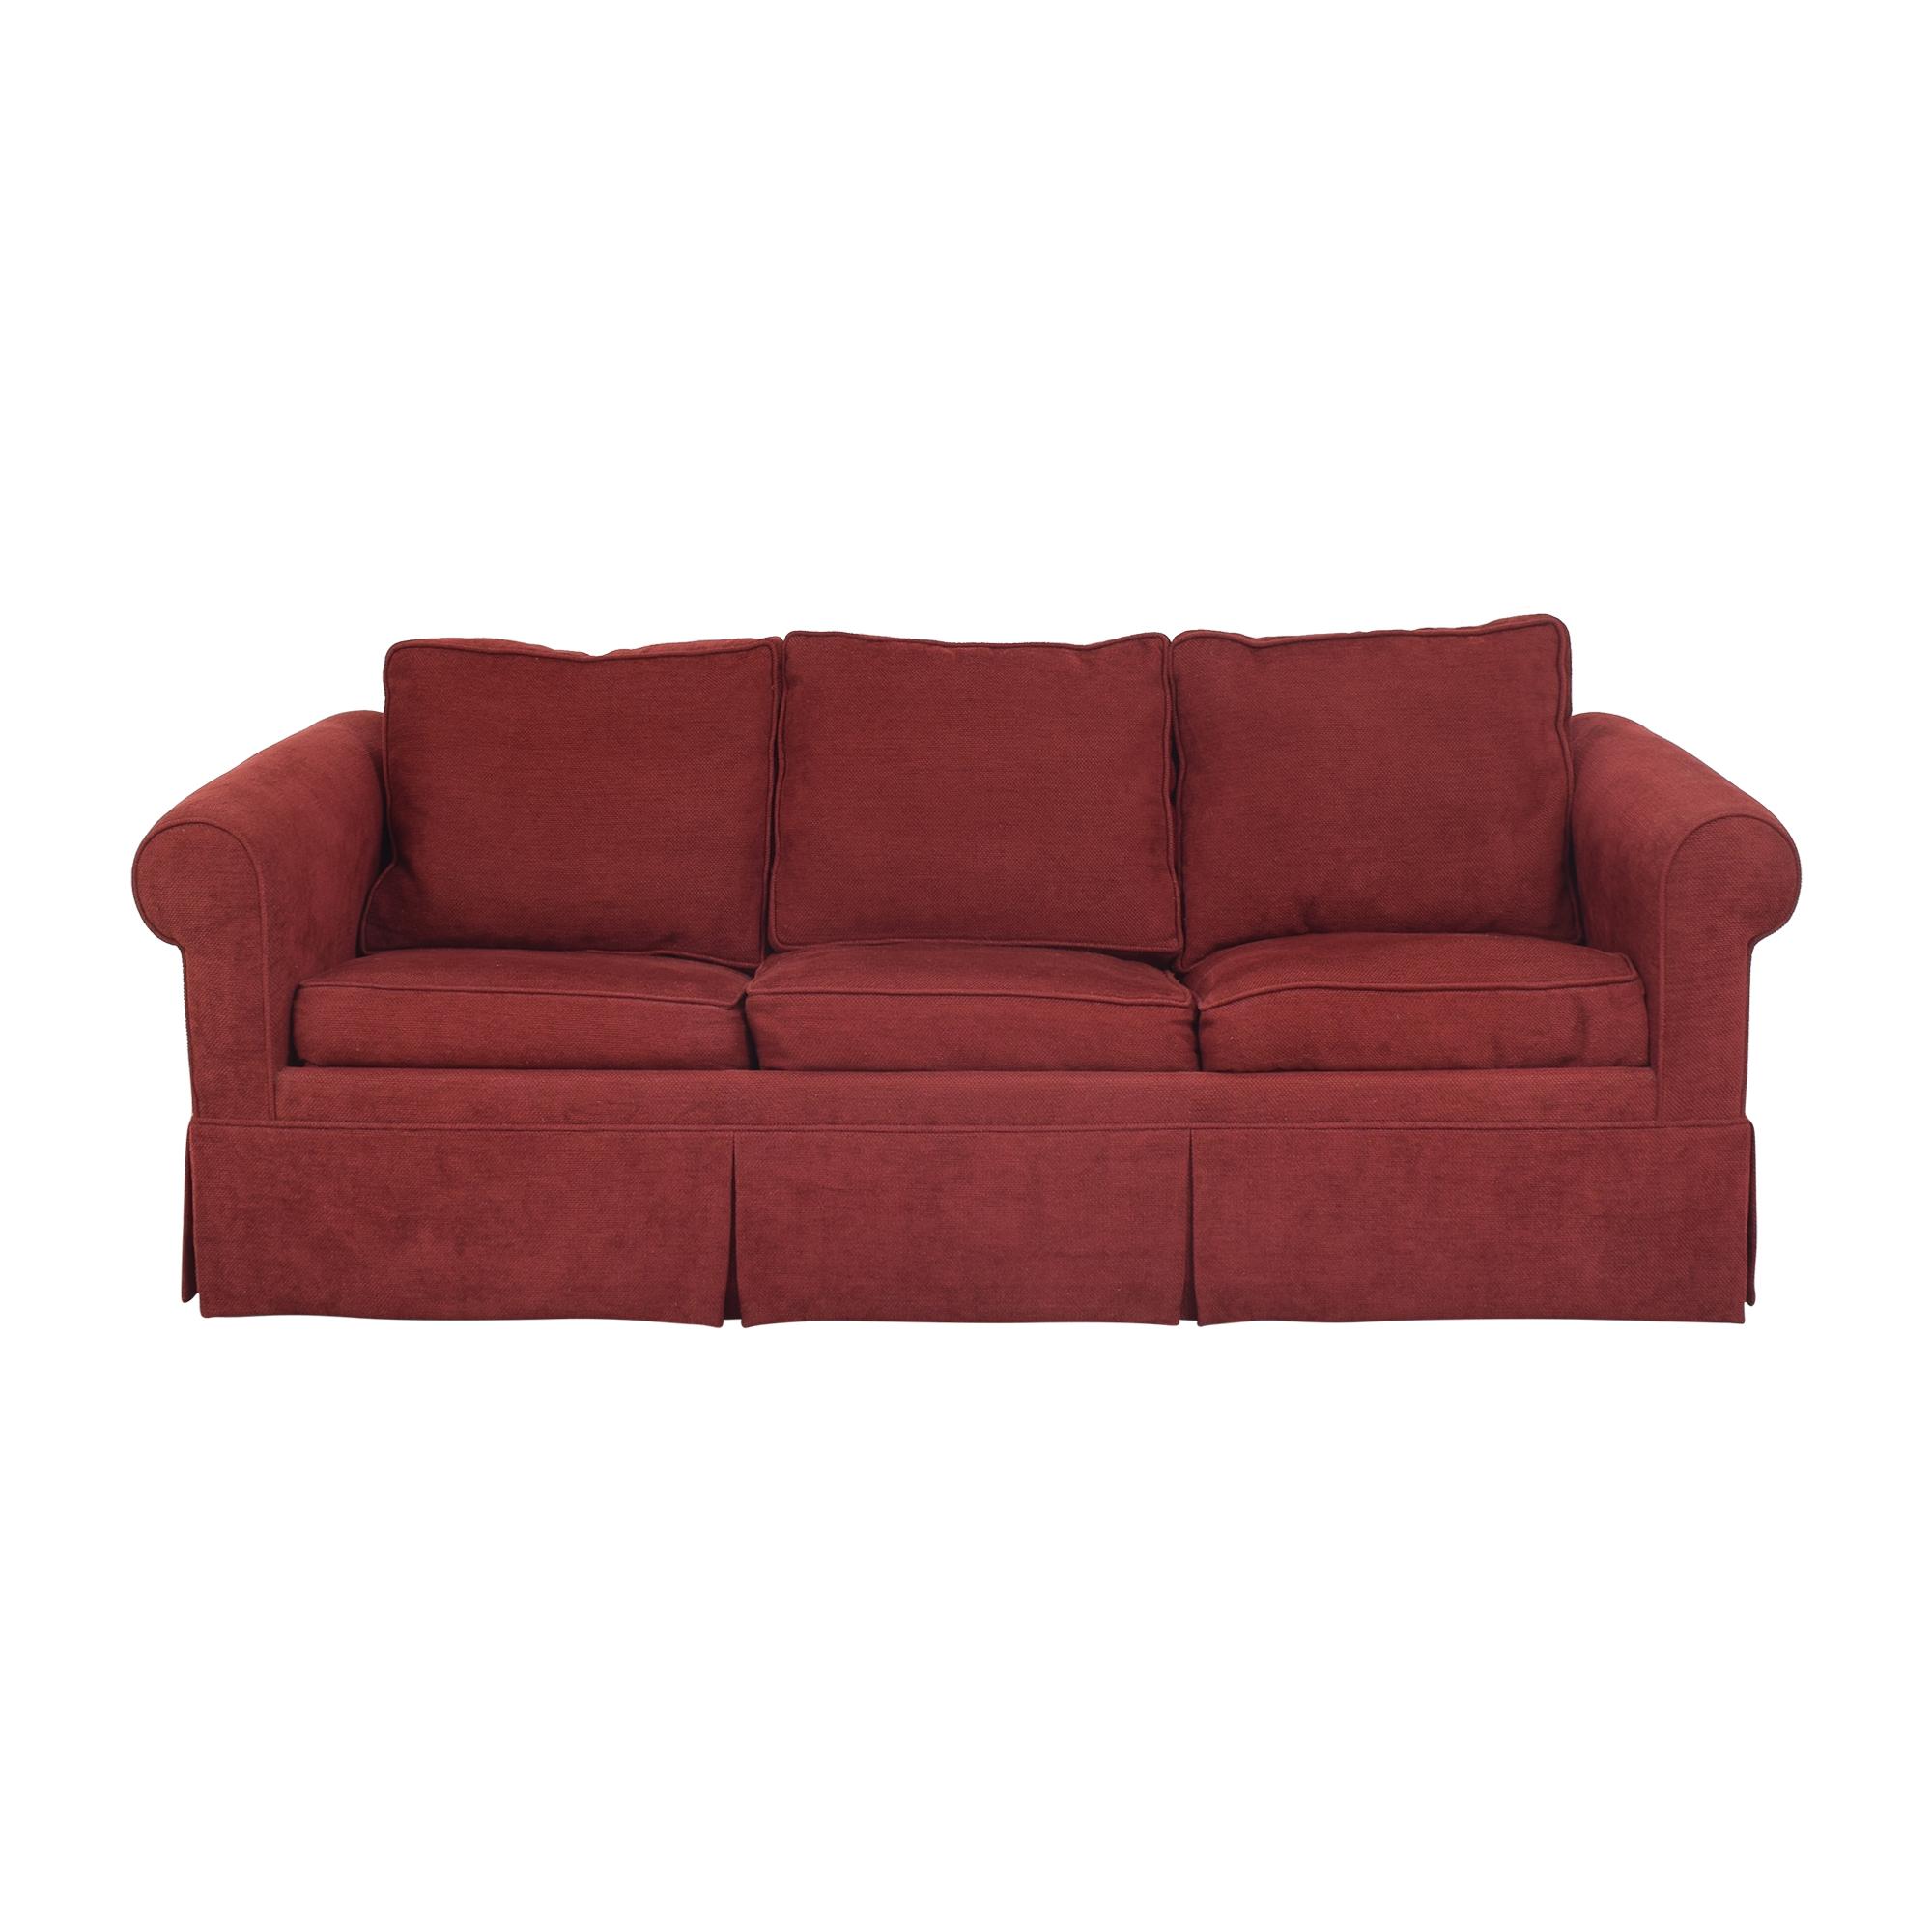 Classic Sofa Classic Sofa Queen Sleeper Sofa for sale